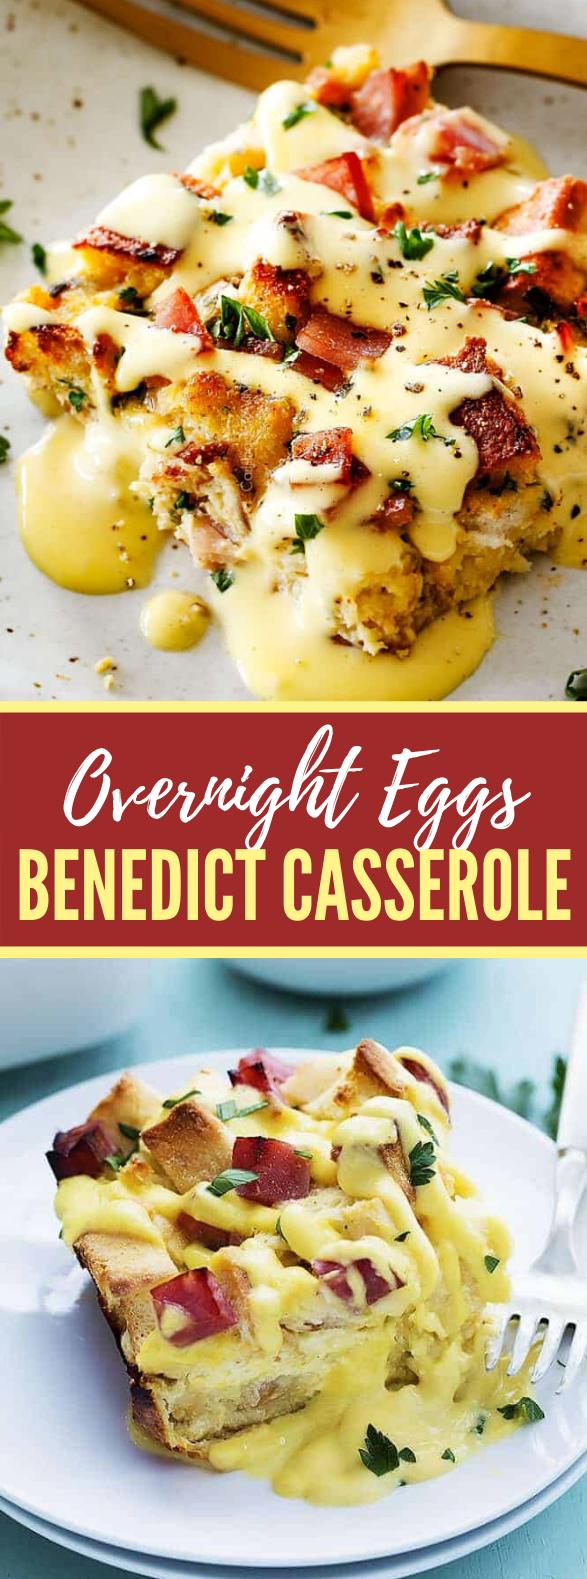 Eggs Benedict Casserole (Overnight Breakfast Casserole) #brunch #easyrecipes